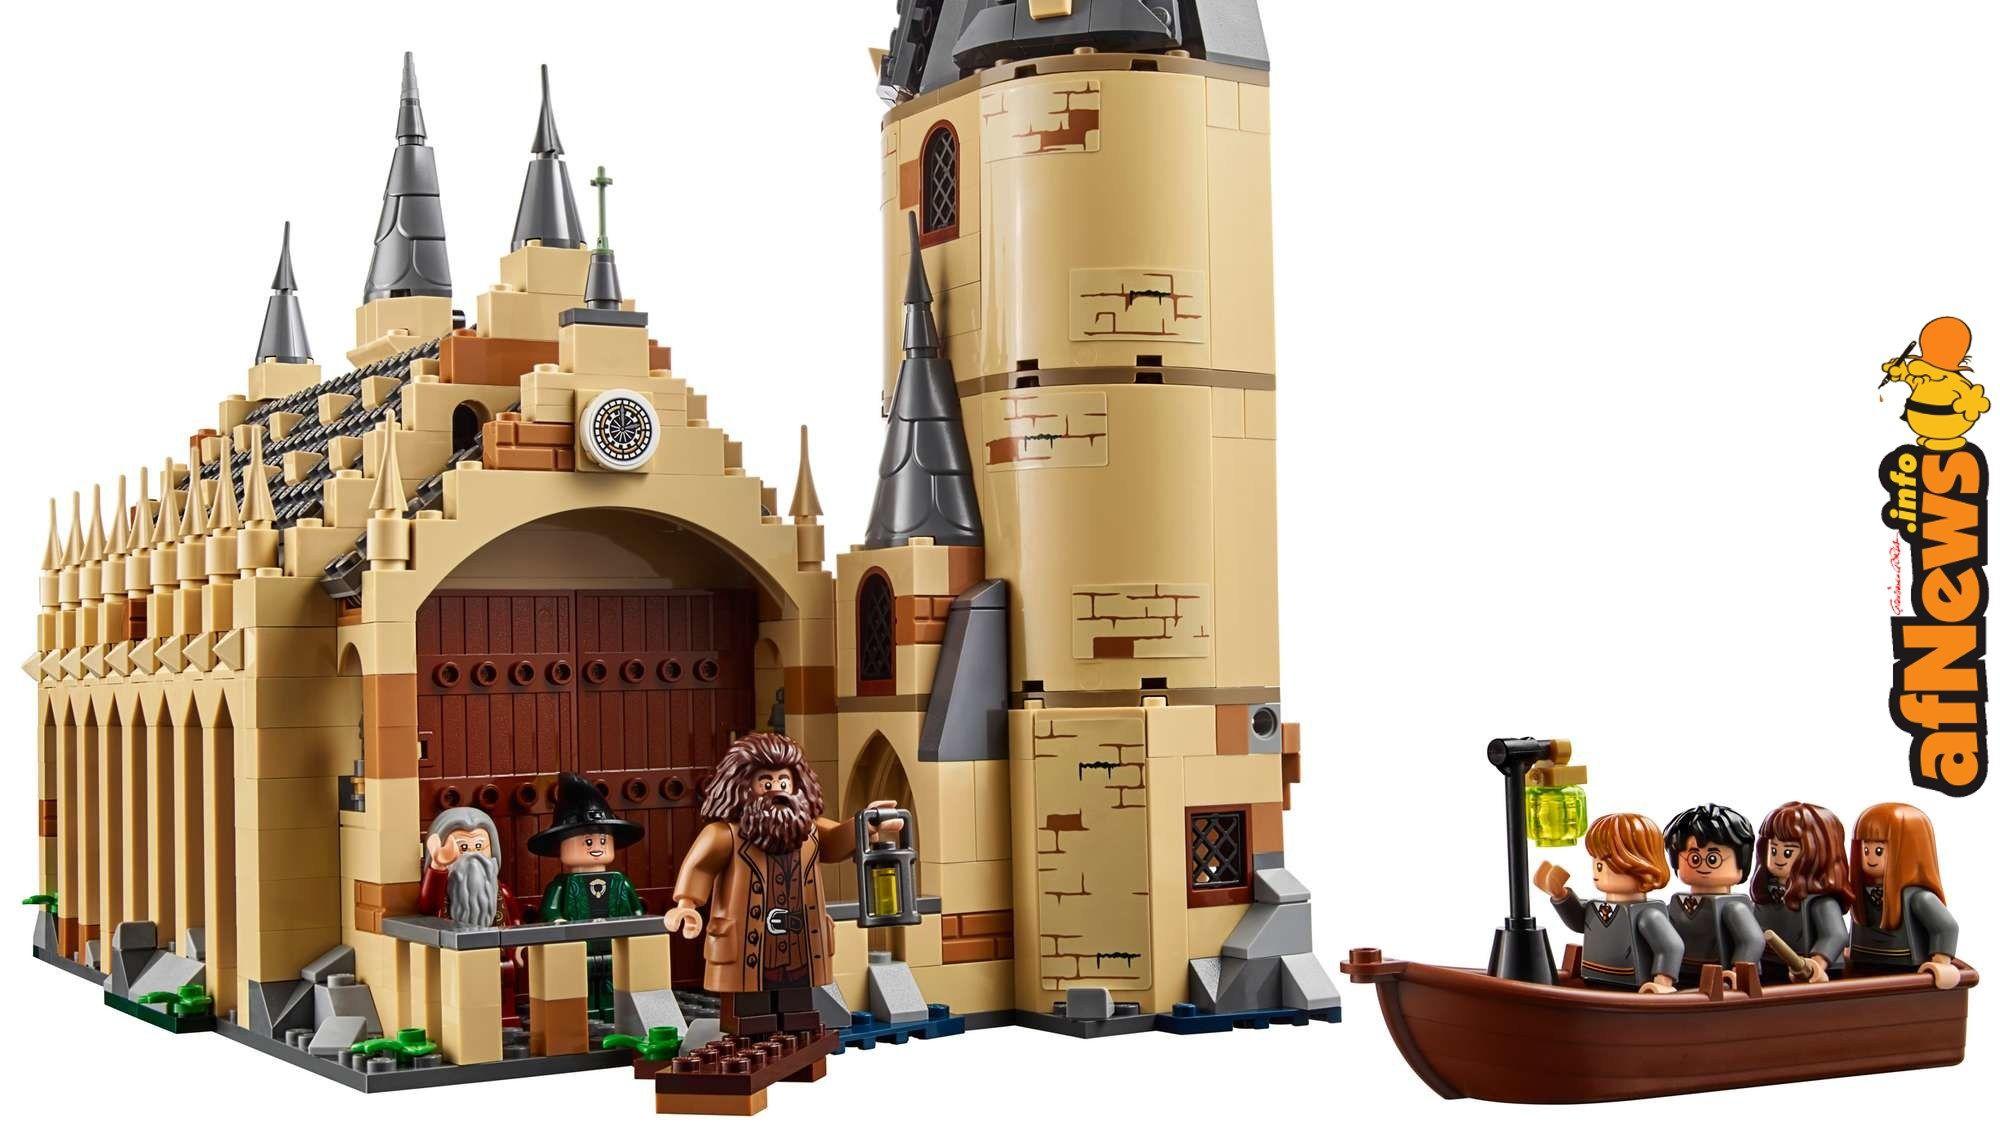 Lego Harry Potter Il Nuovo Castello Di Hogwarts Sta Per Arrivare Hogwarts Grosse Halle Lego Hogwarts Lego Harry Potter